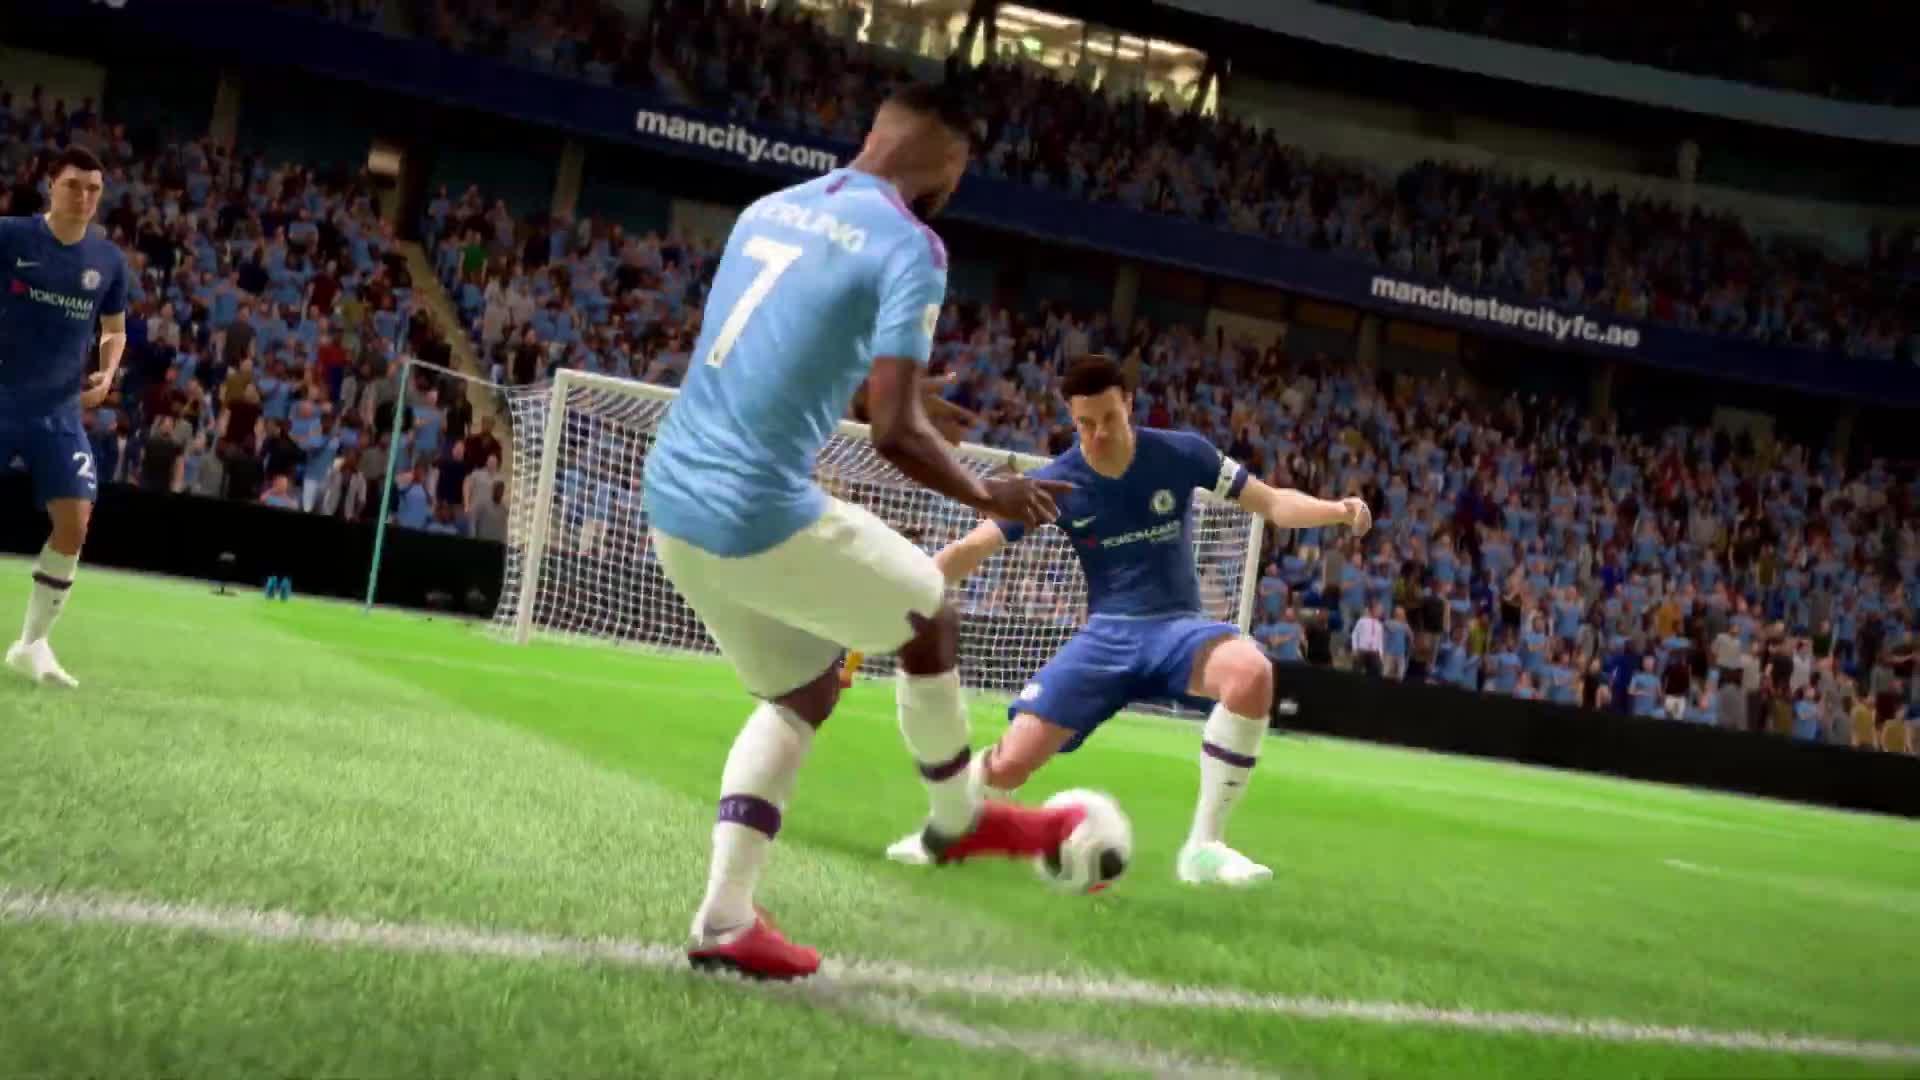 Trailer, Electronic Arts, Ea, Fußball, EA Sports, Fifa, Fifa 20, Elec